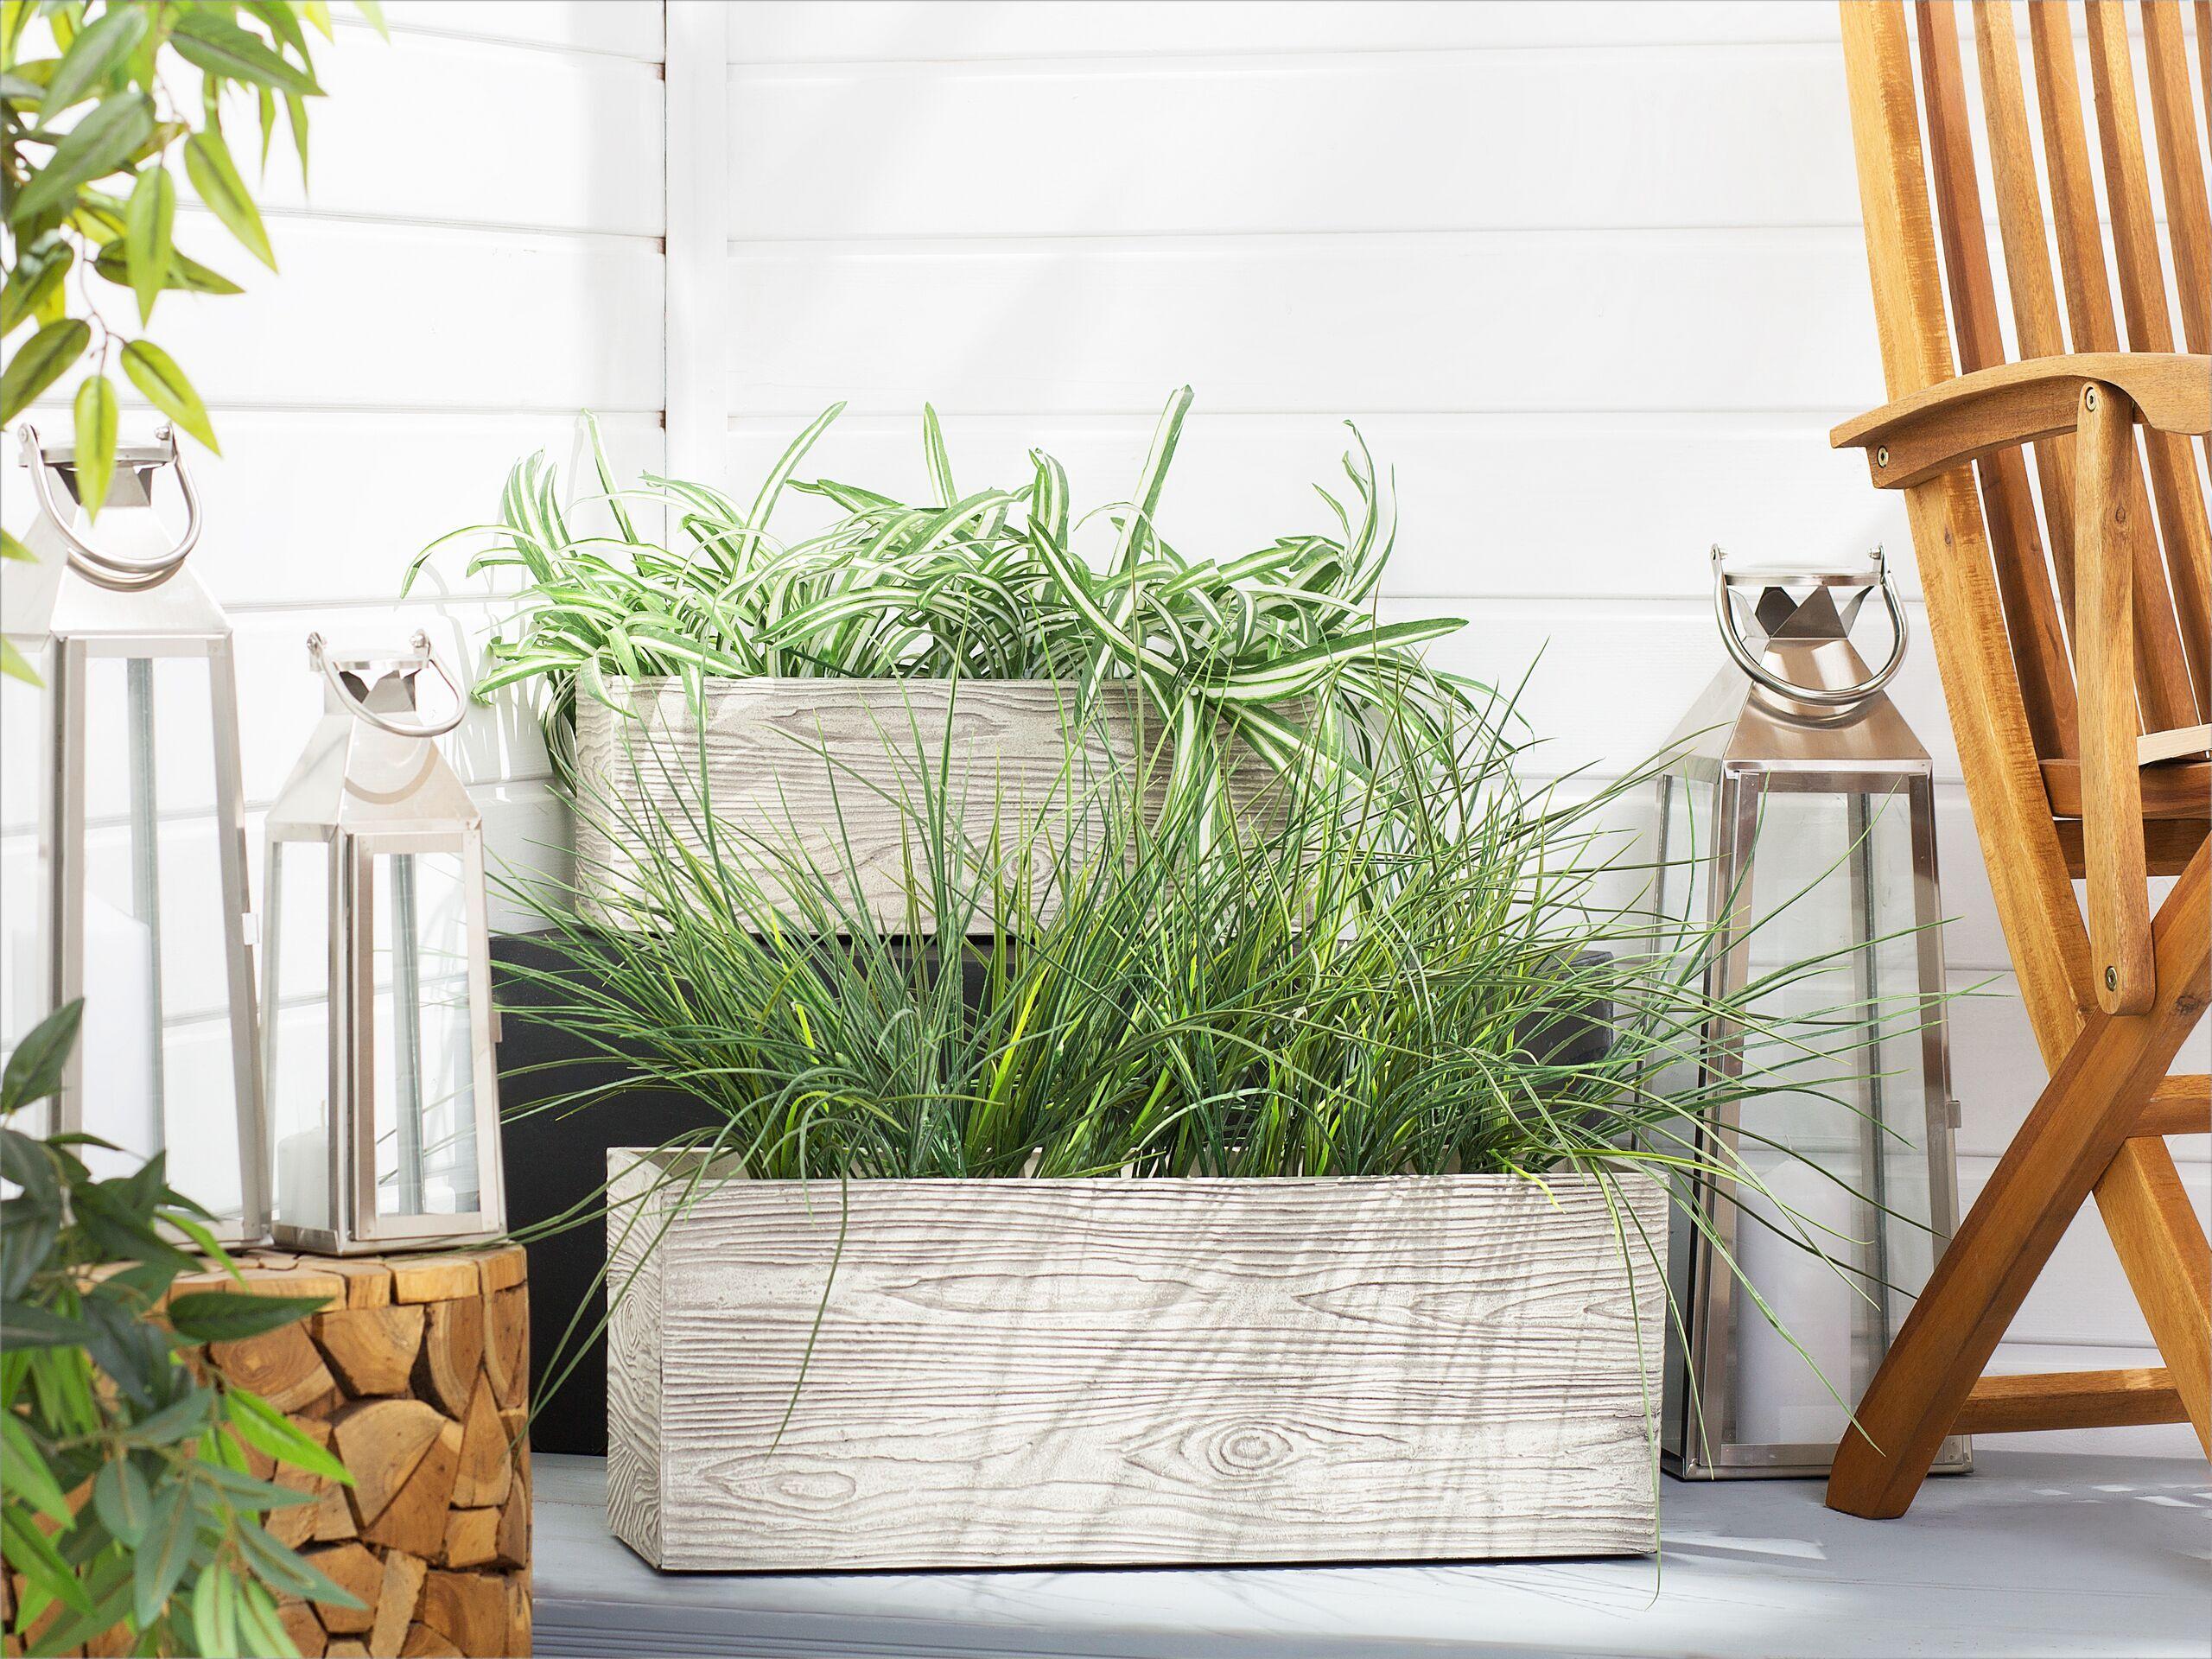 beliani set di 2 vasi da fiori rettangolari bianchi effetto legno moderni